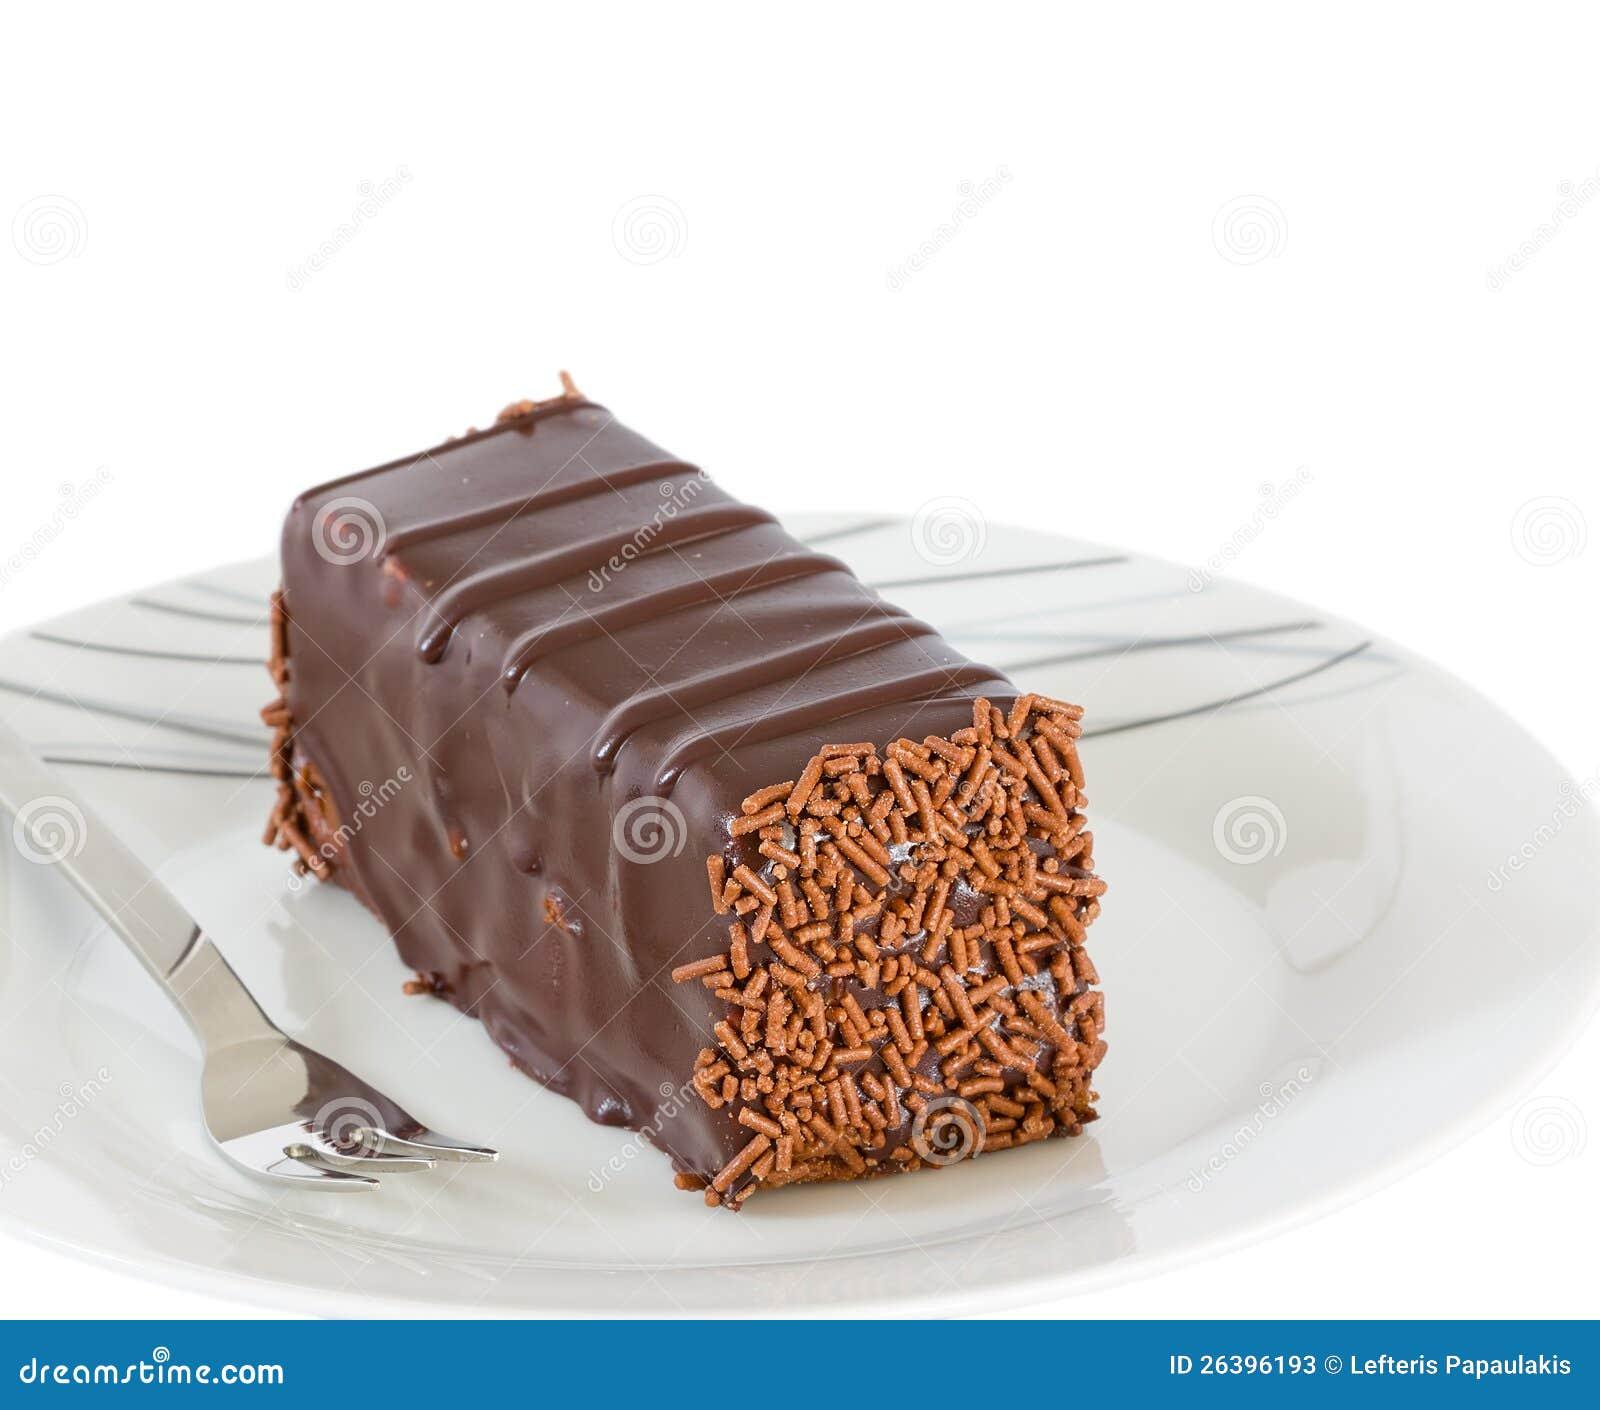 Decoration Of Chocolate Truffle Cake : Chocolate Cake With Truffle Decoration Isolated Stock ...